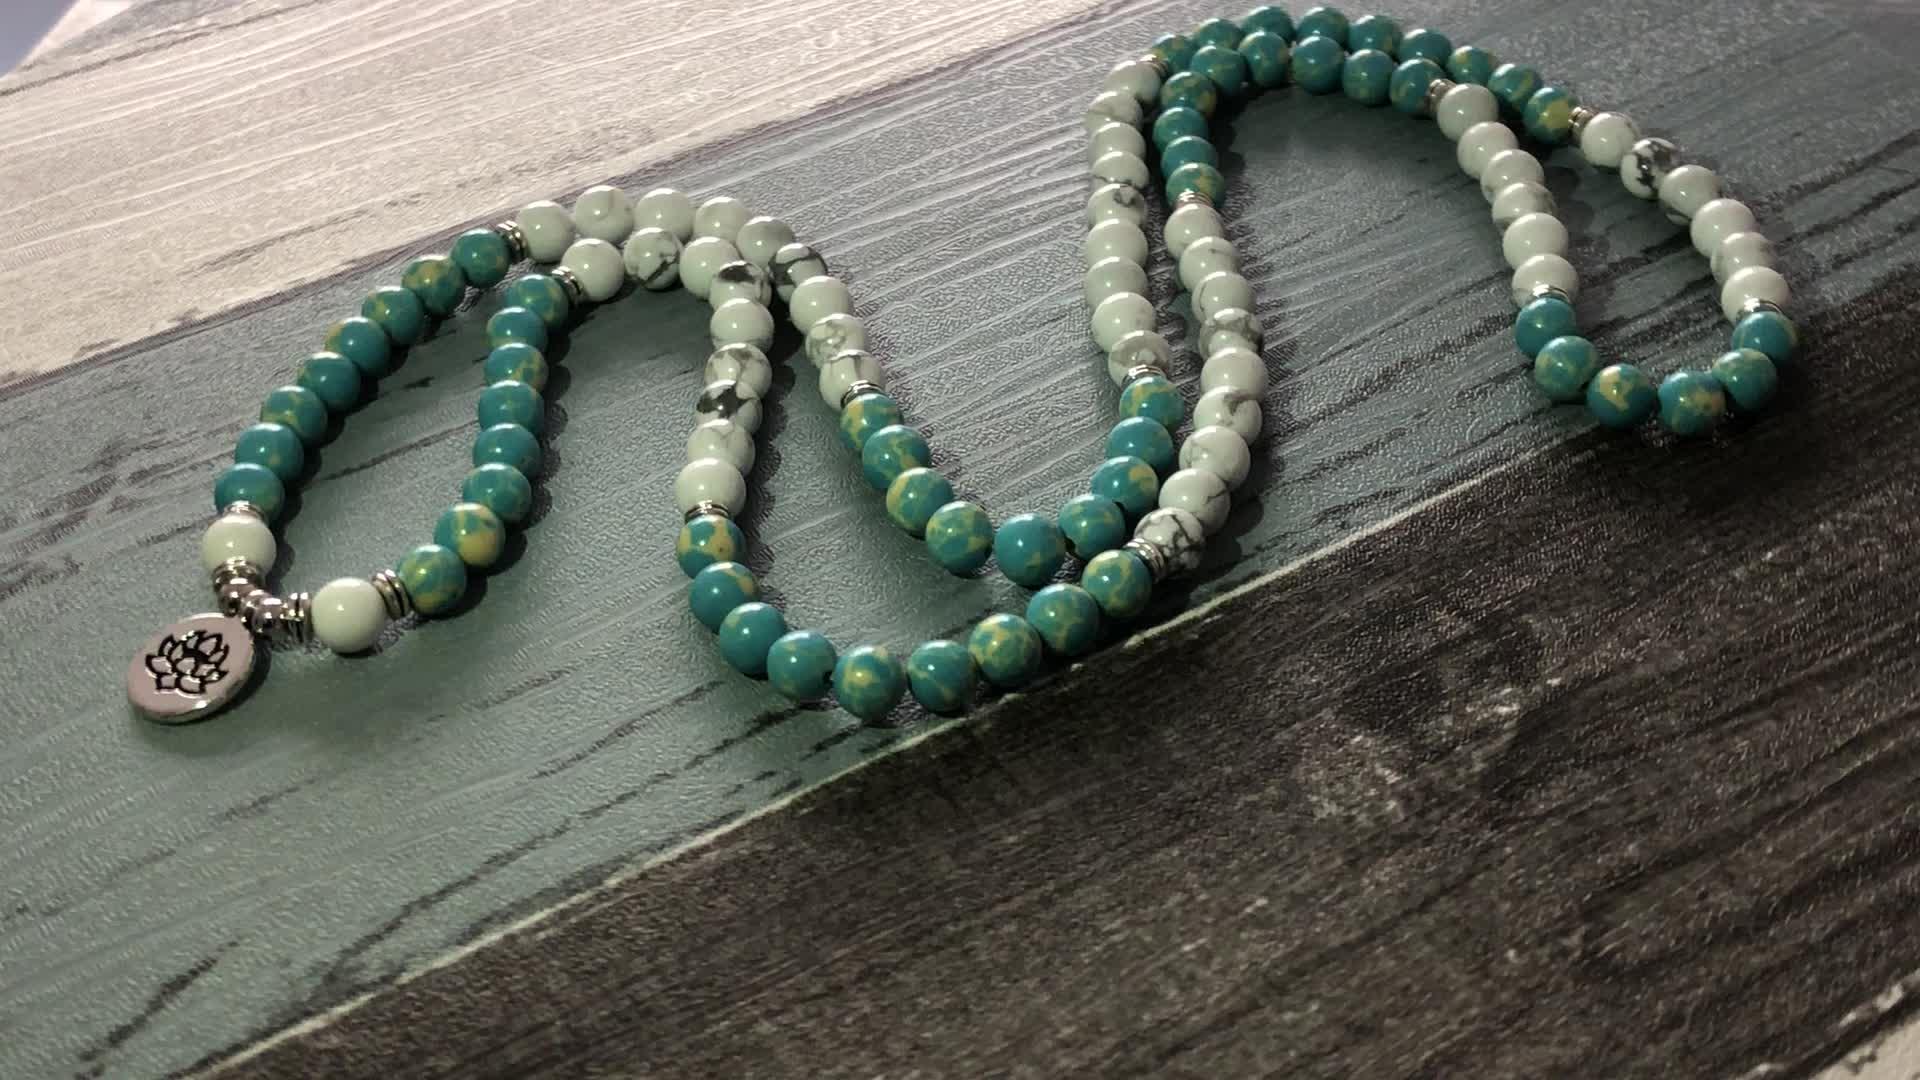 SN1546 Lotus Bracelet or Necklace High Quality Yogo Jewelry 108 Black Link Jade Stretchy Bracelet Healing Meditation Om Bracelet